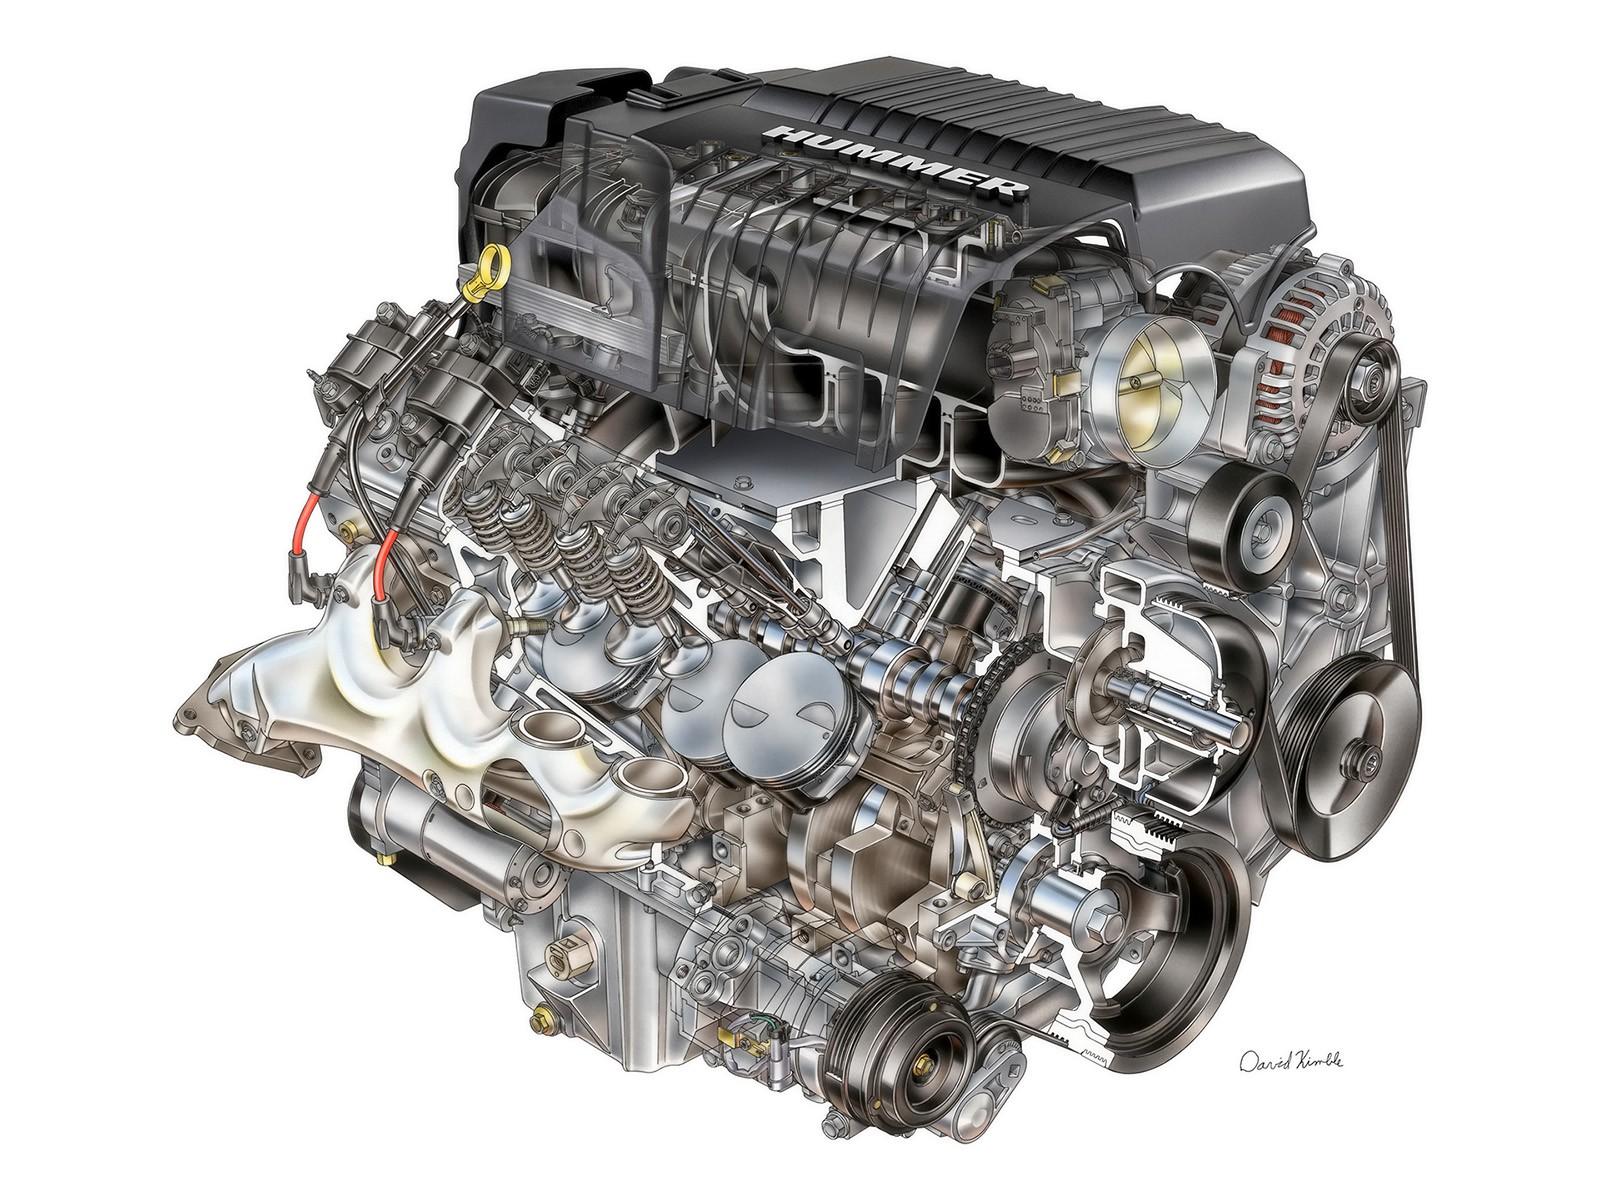 Hummer H2 Engine Diagram Kia Sorento 3 5l 2003 2006 My 2008 2 Wallpaper Of